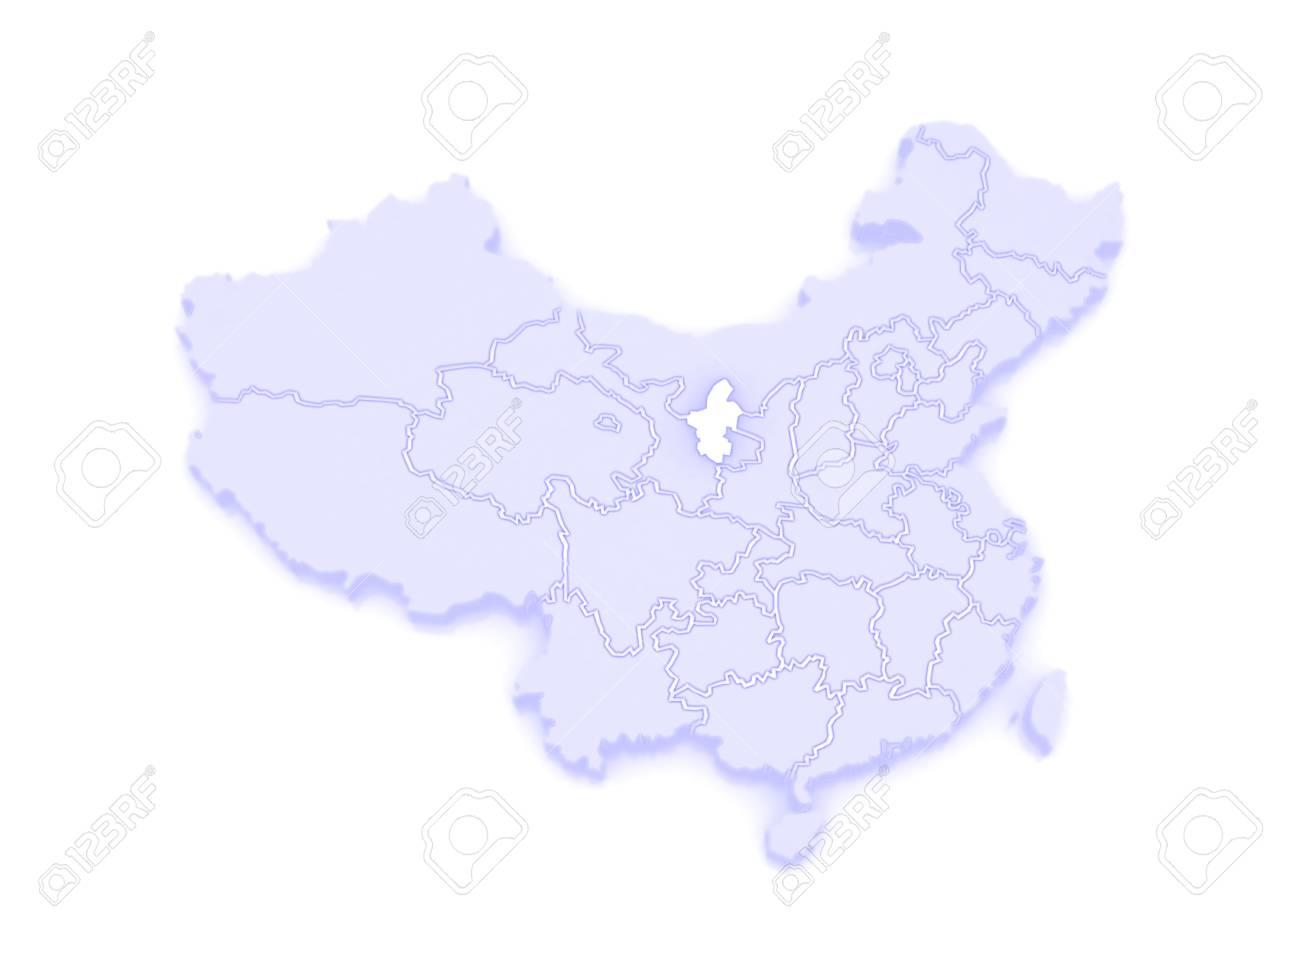 Ningxia China Map.Map Of Ningxia Hui Autonomous Region China 3d Stock Photo Picture